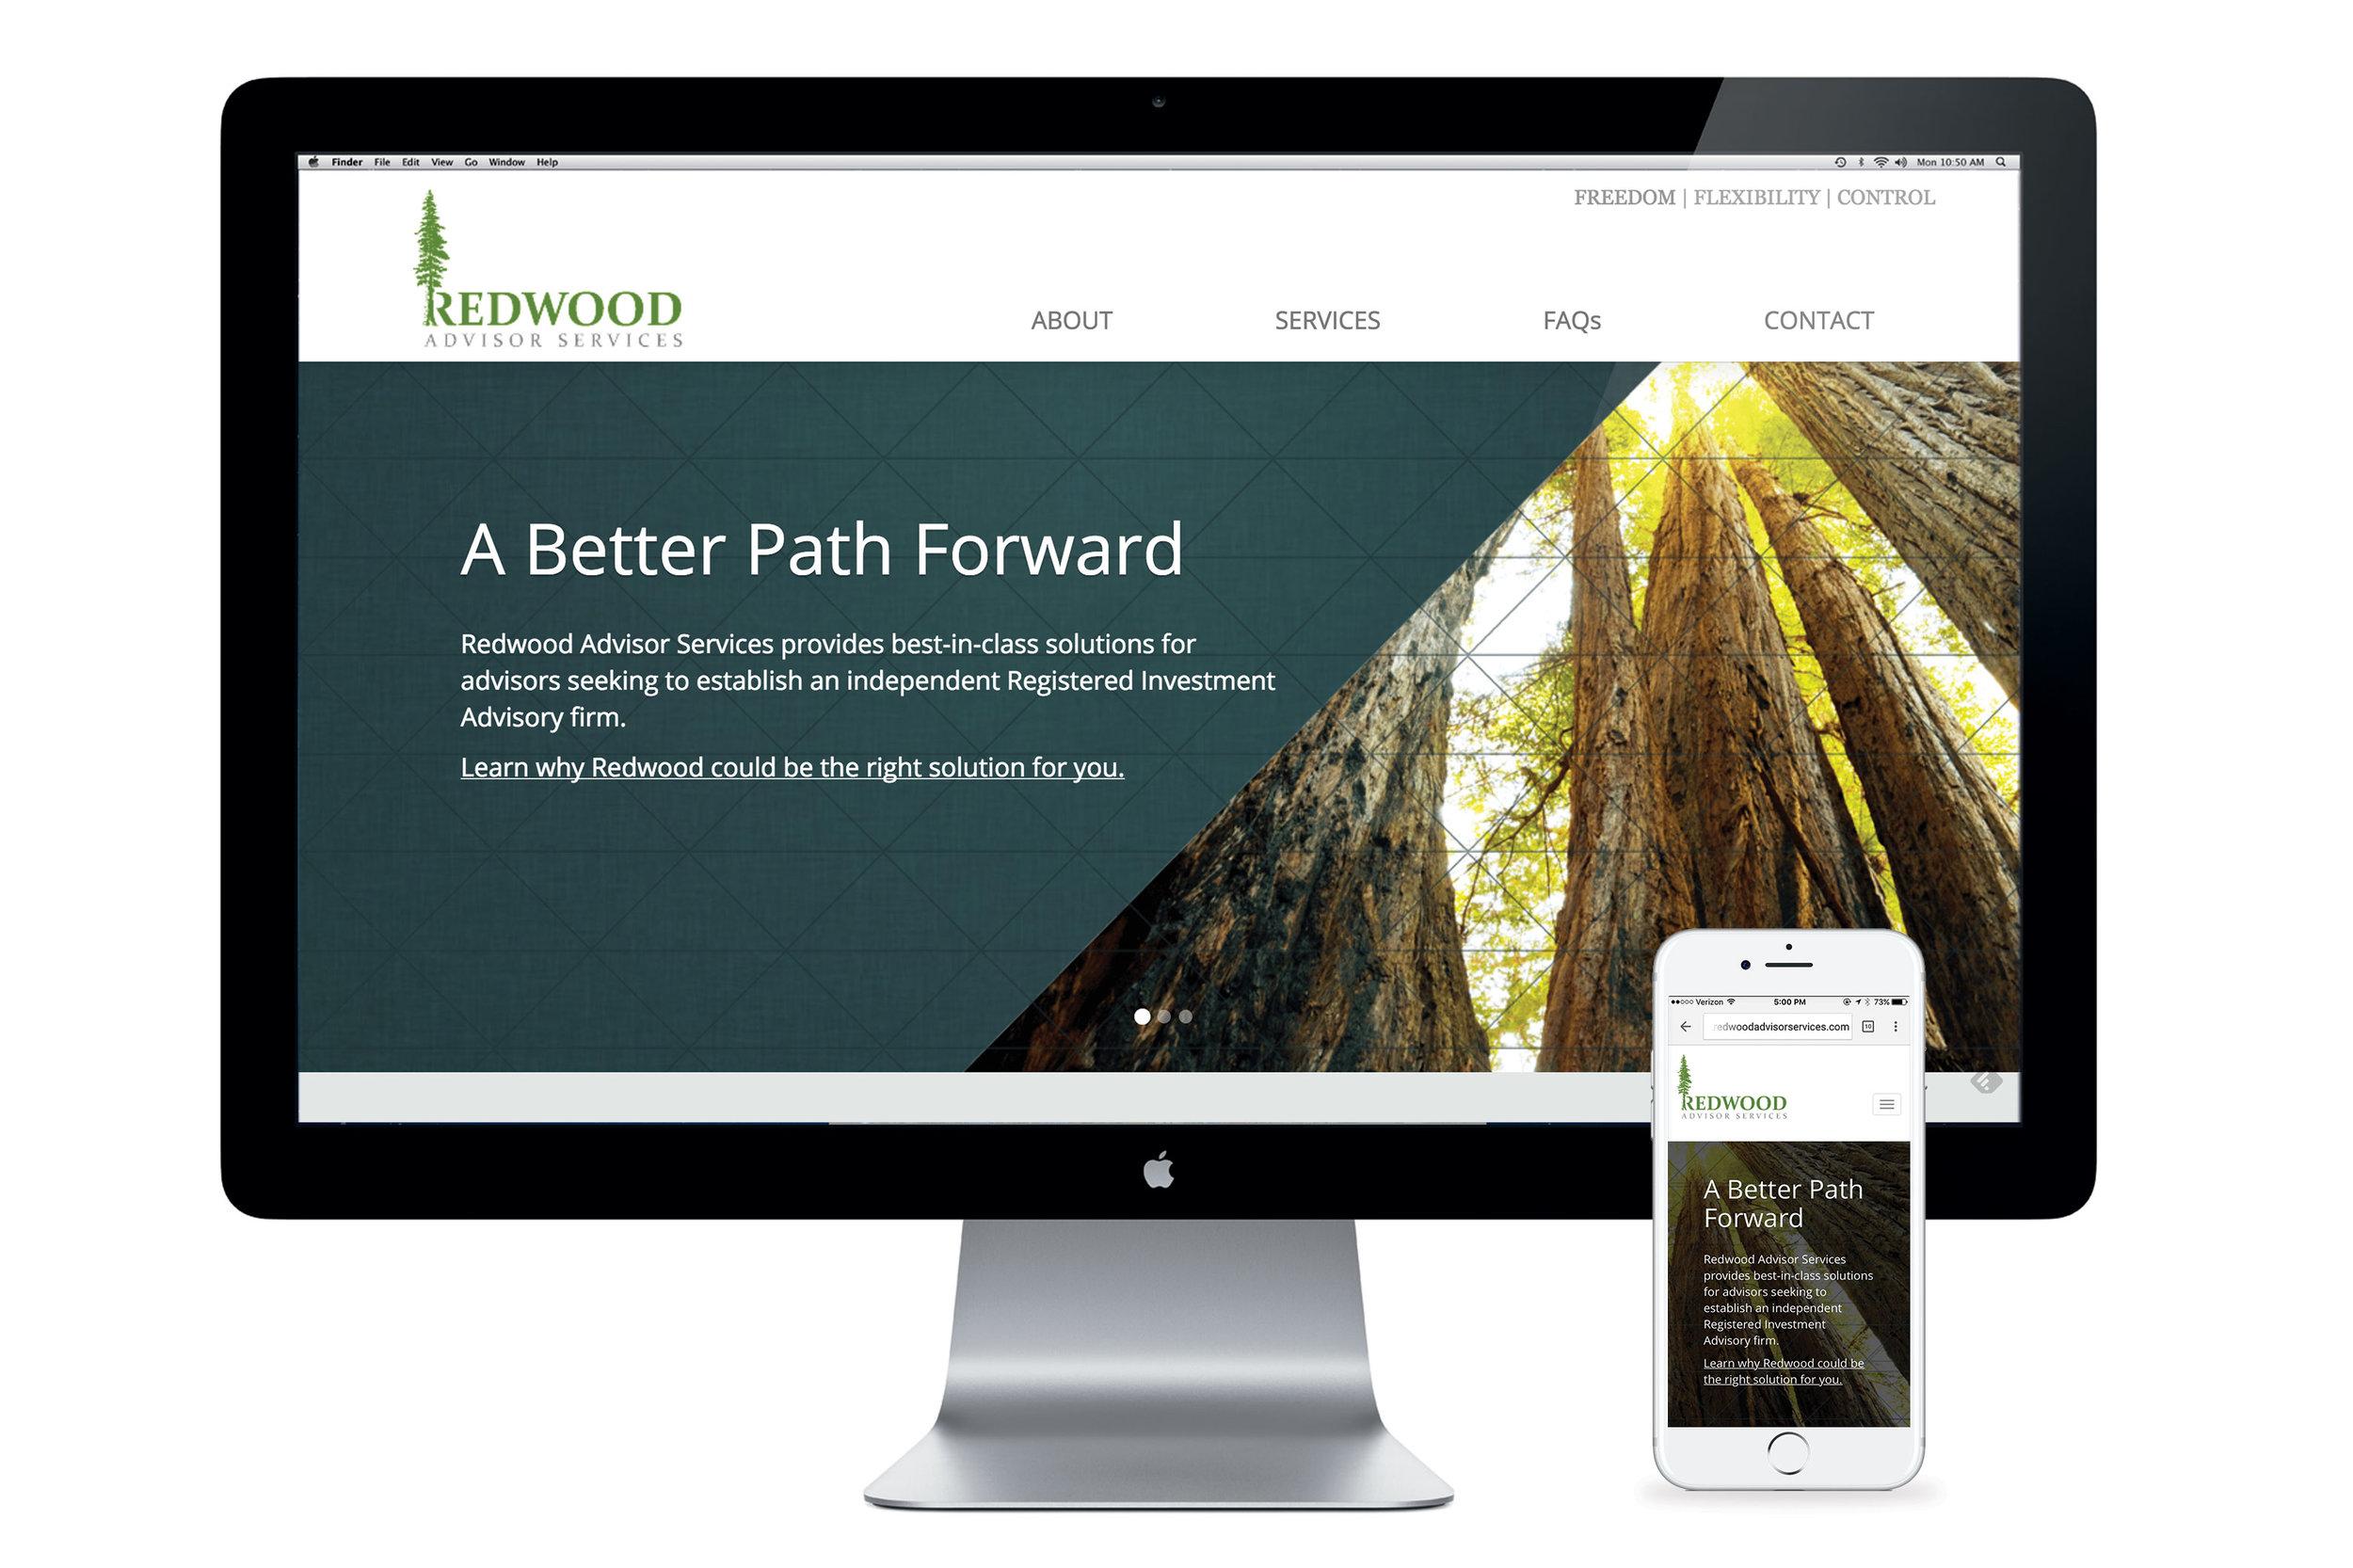 redwood_website.jpg